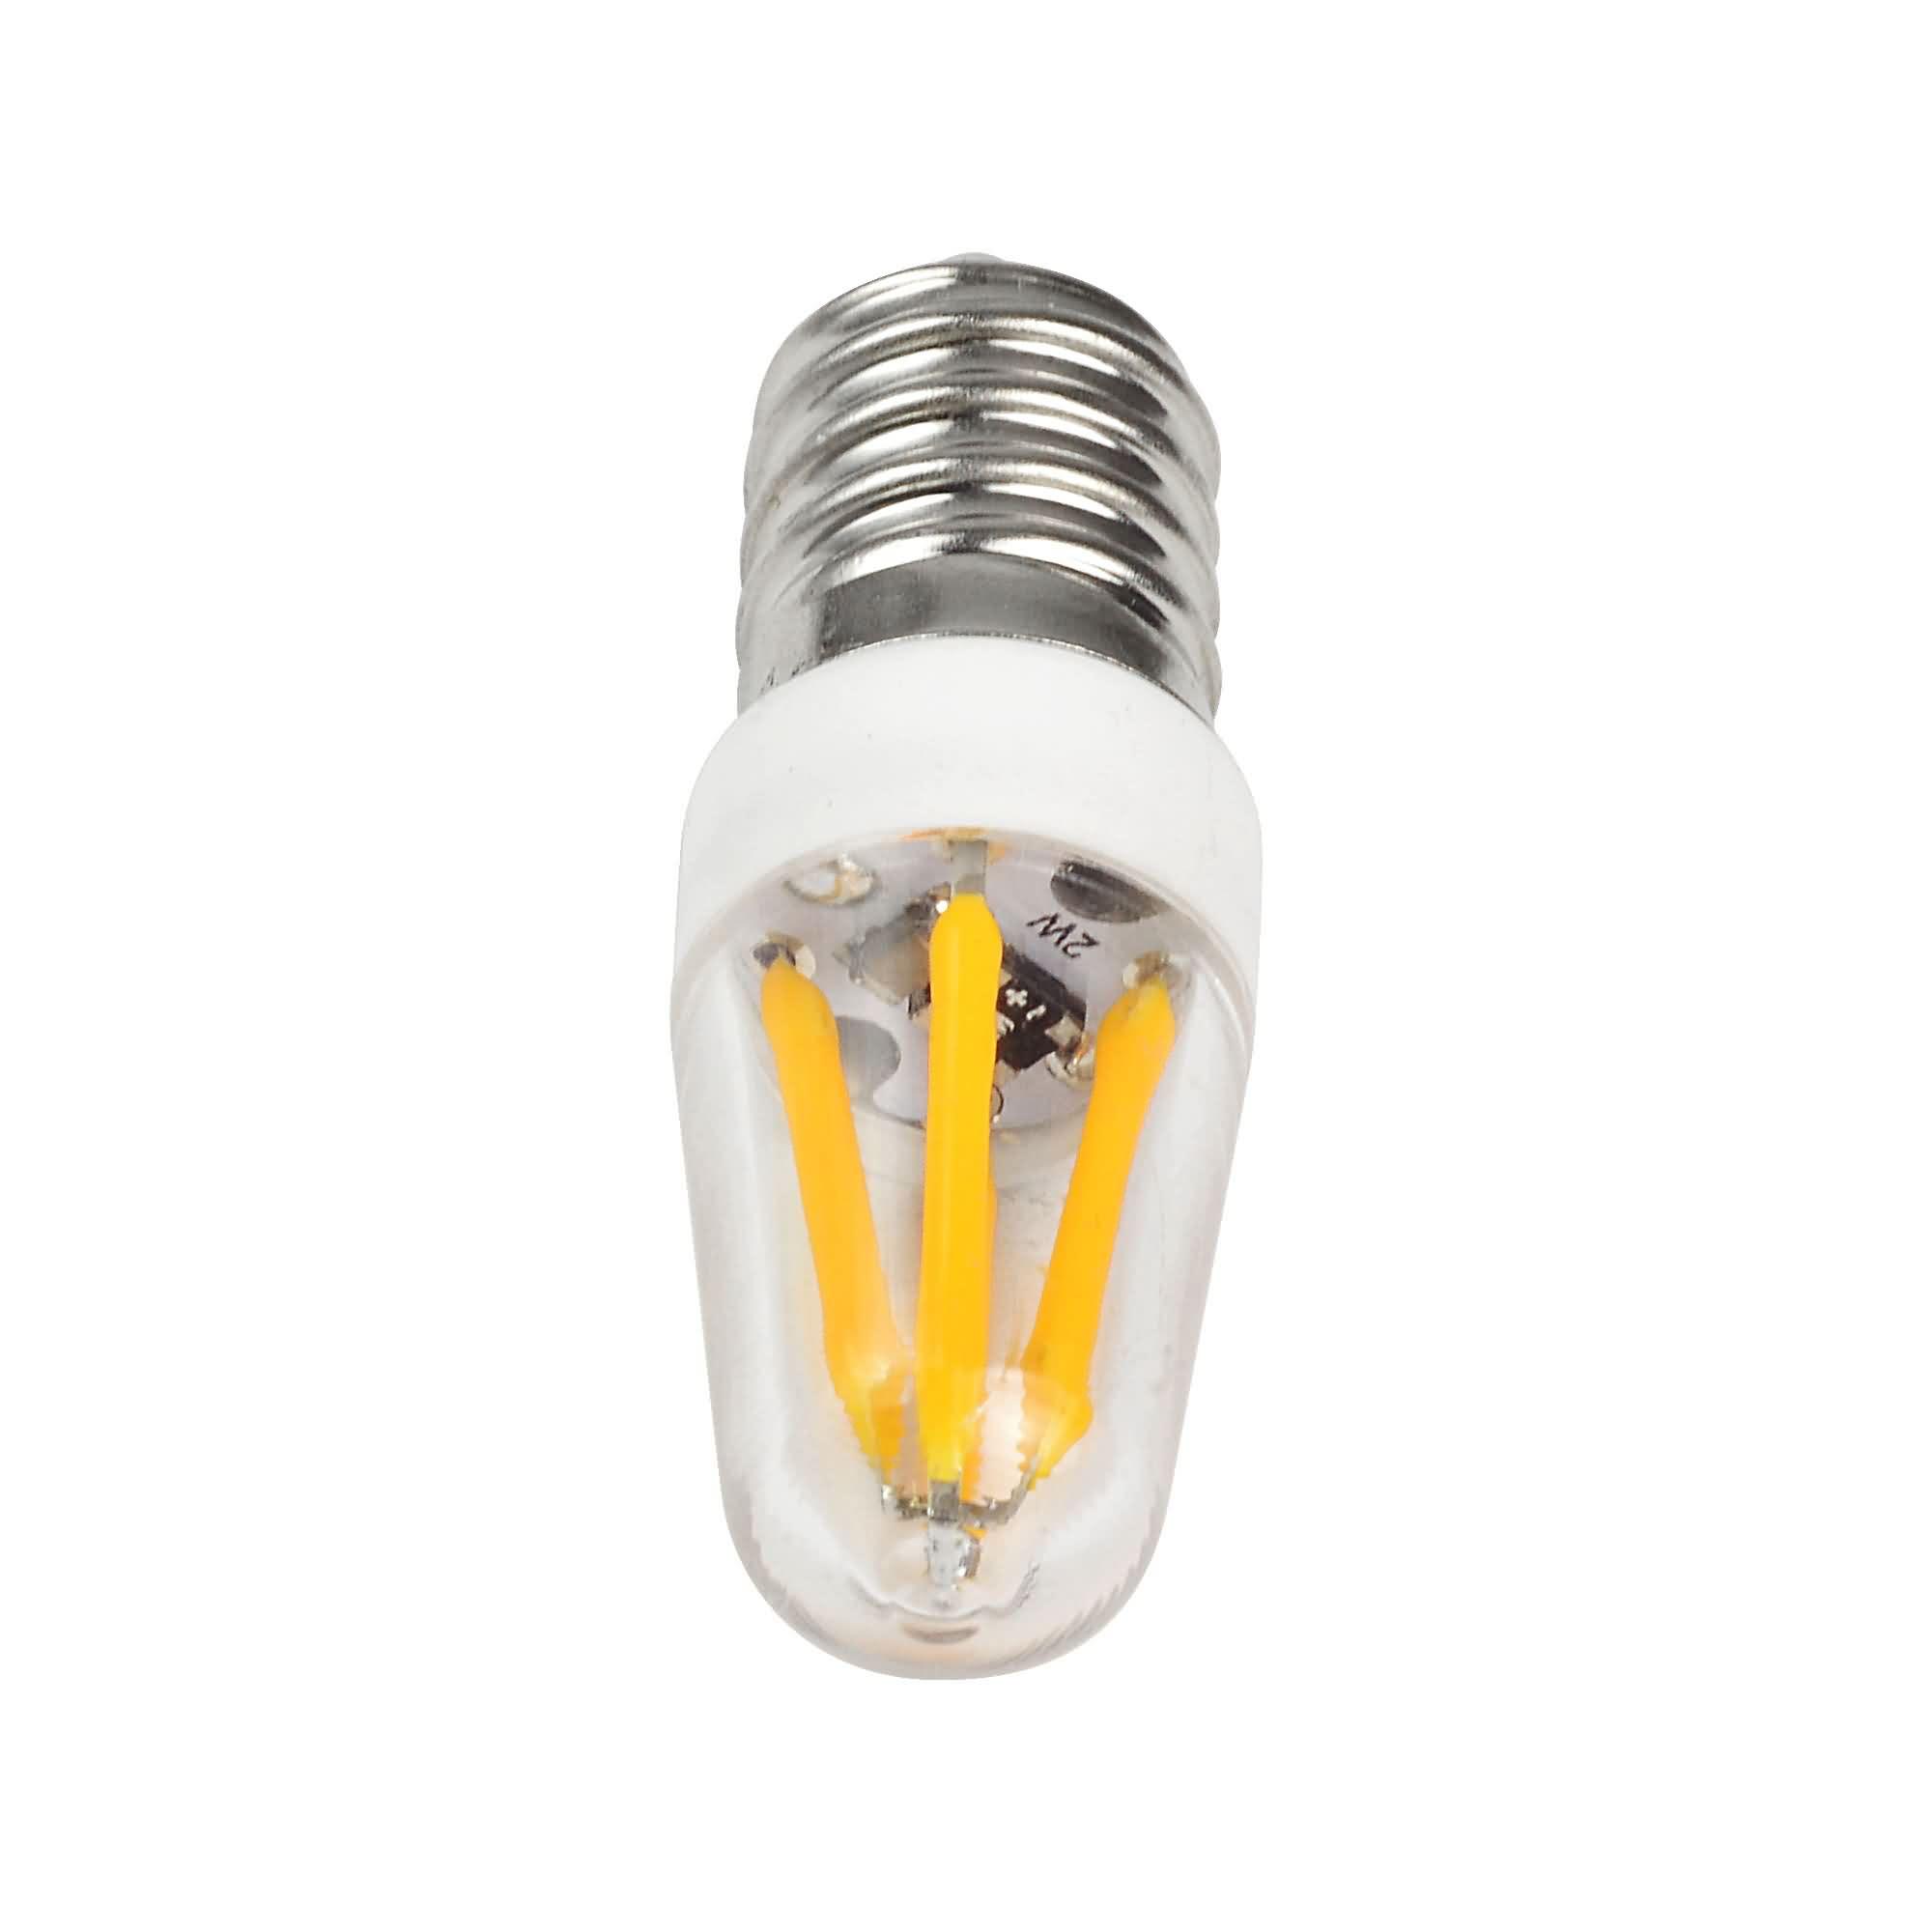 MengsLED – MENGS® E14 3W LED Light With PC Material COB LED